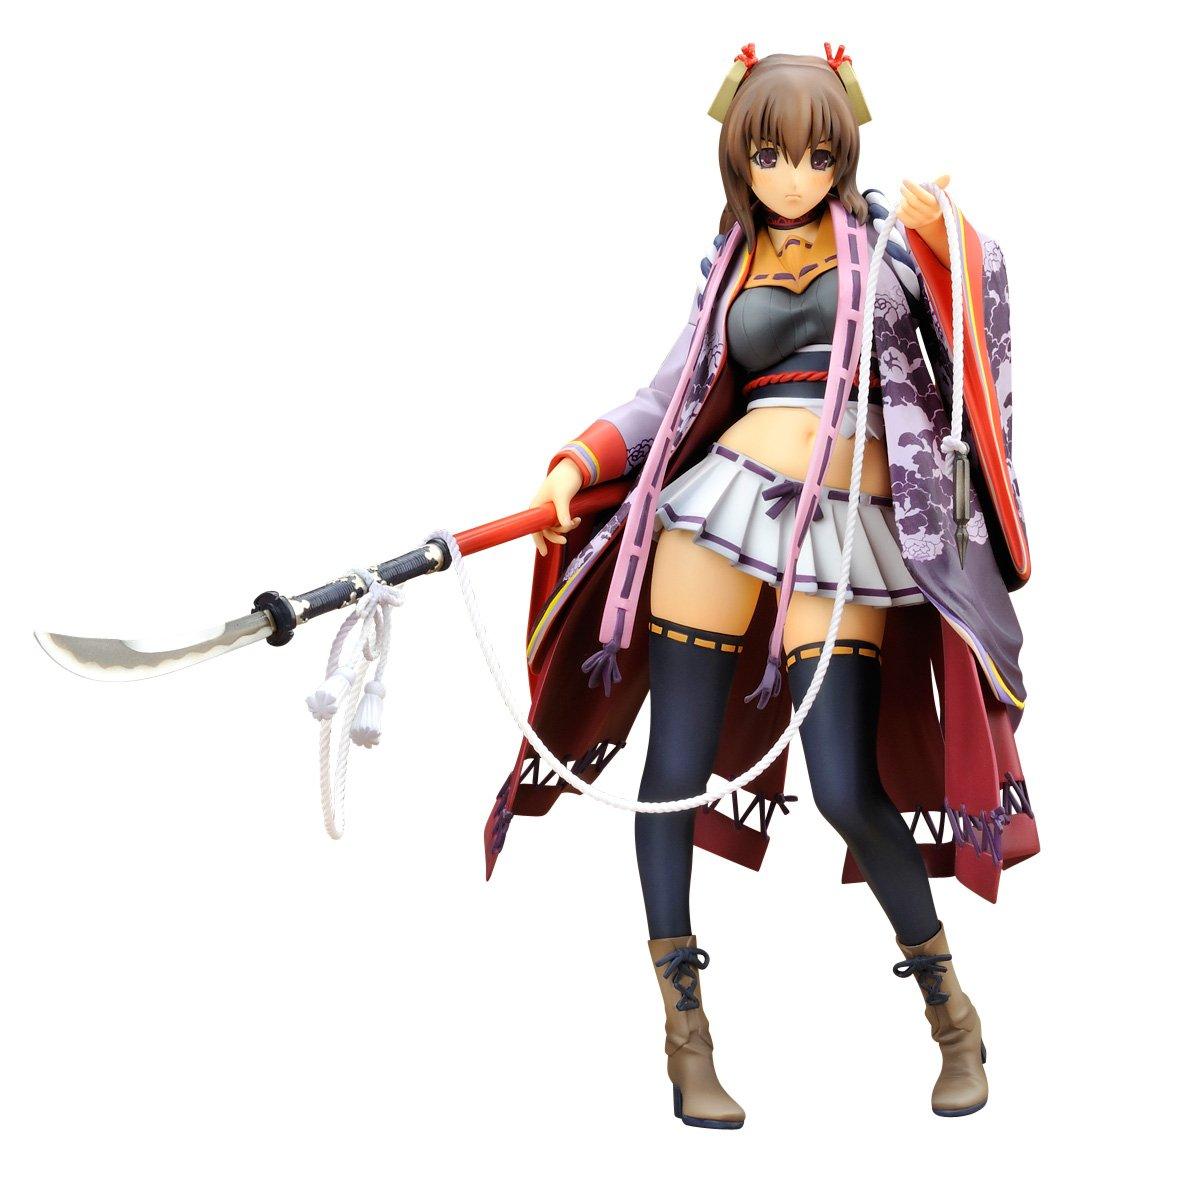 Hyakka ryouran samurai girls senhime 1 8 scale pvc figure amazon co uk toys games